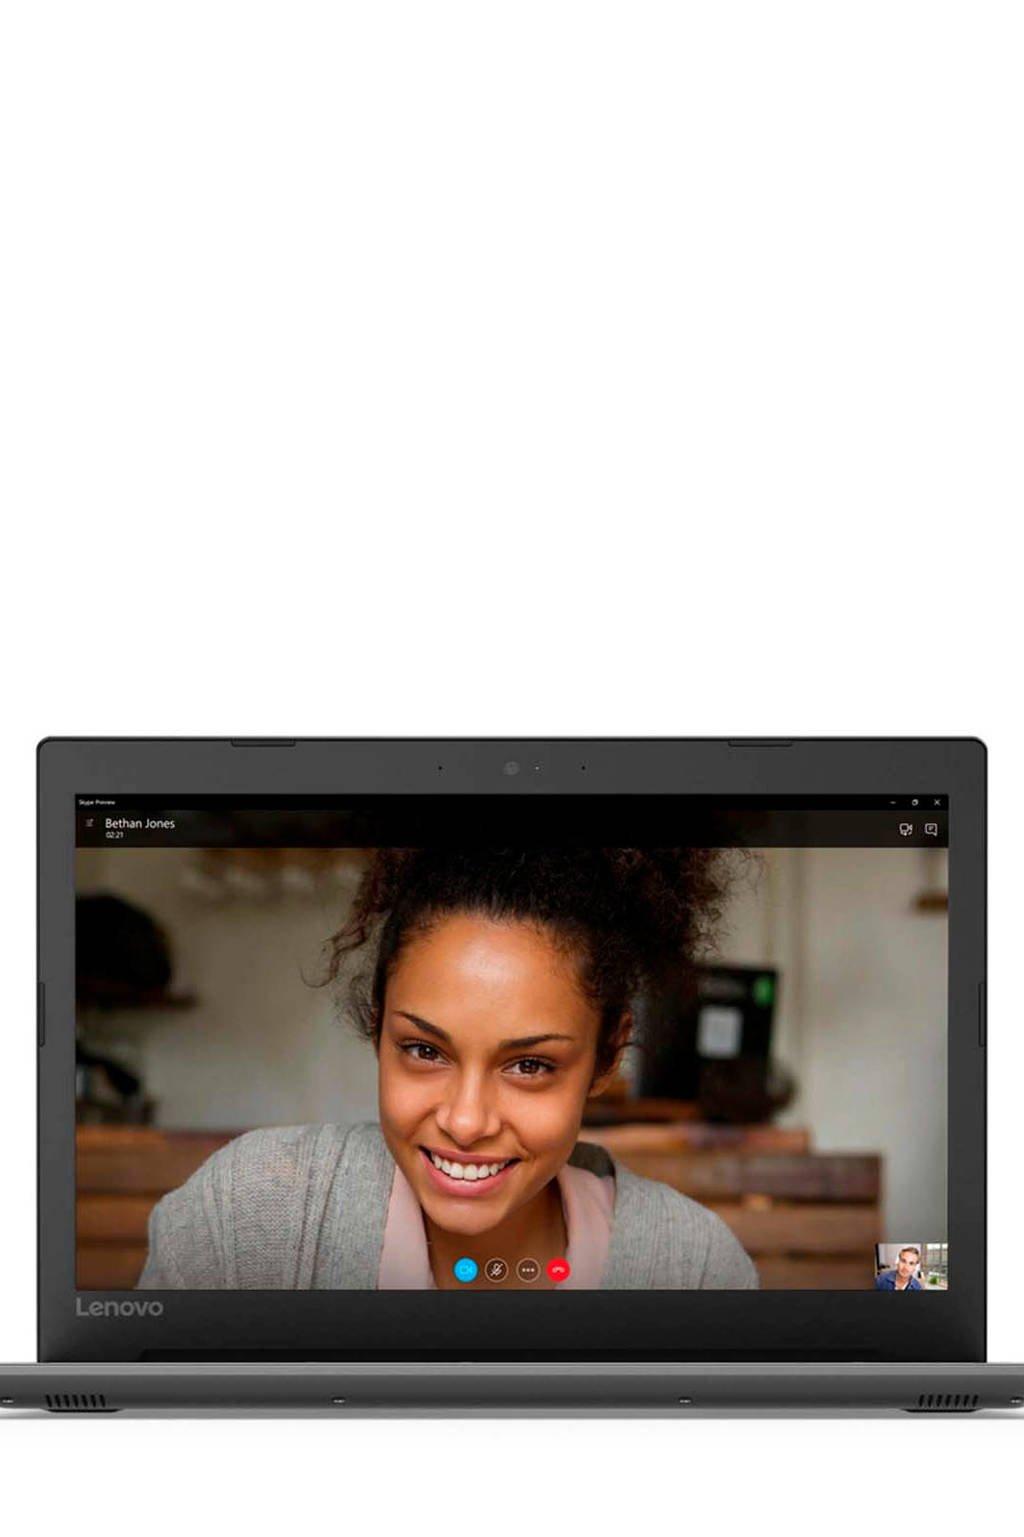 Lenovo 330-15IKBR 15.6 inch Full HD laptop